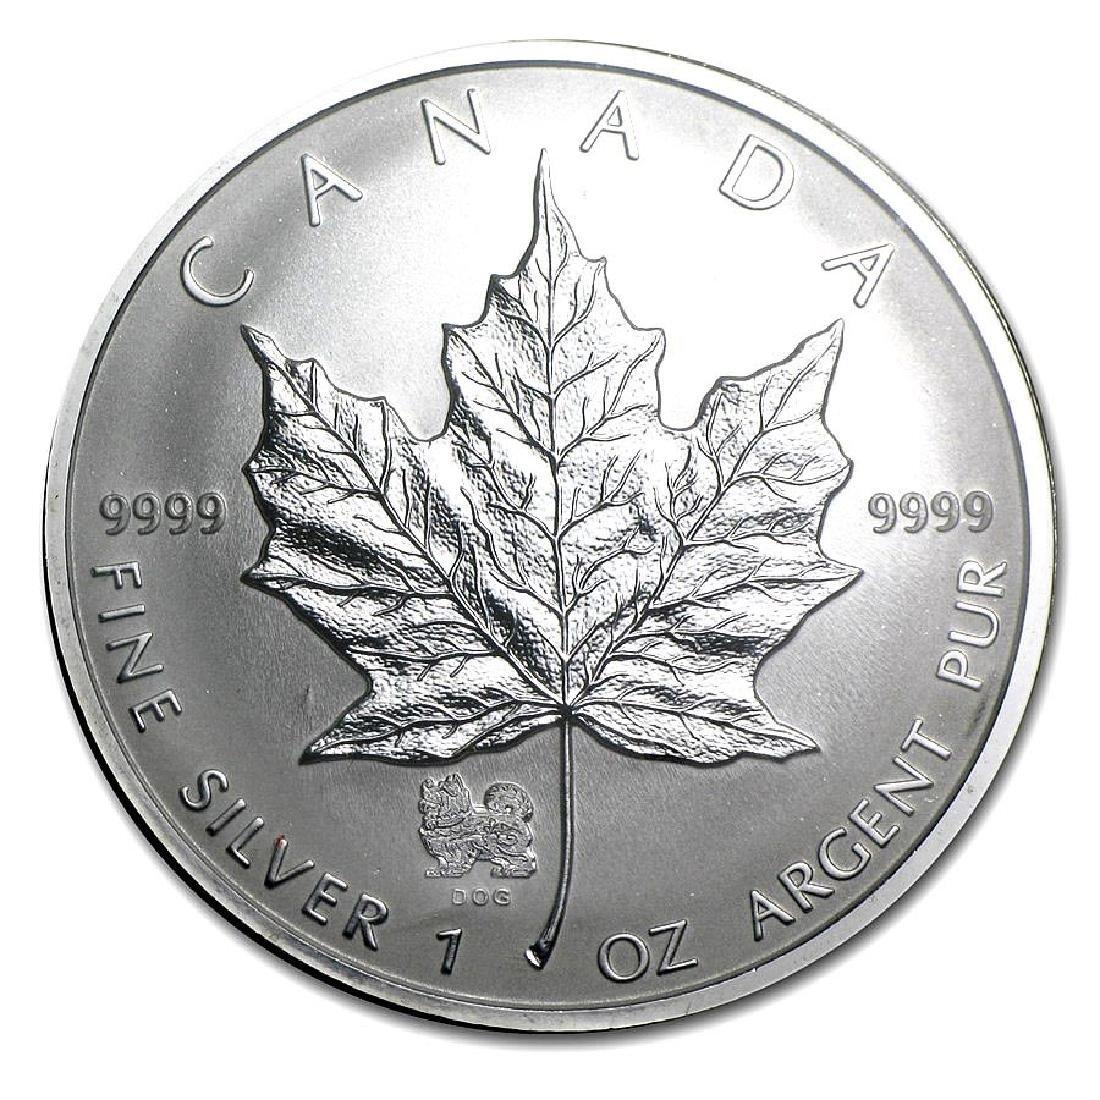 2006 Canada 1 oz. Silver Maple Leaf Reverse Proof Dog P